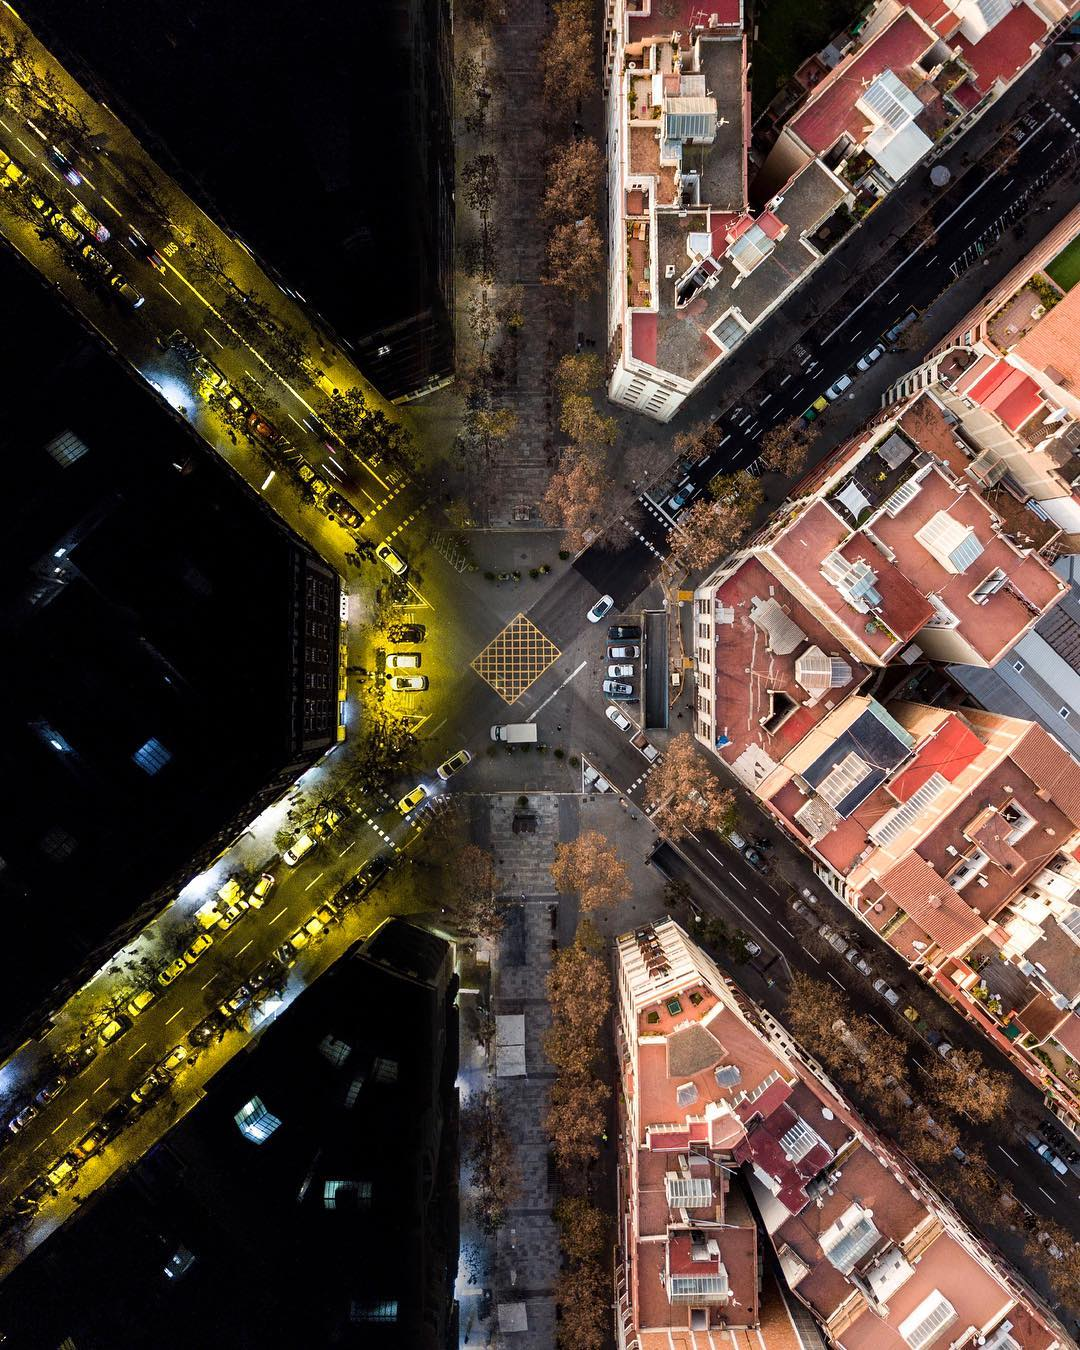 Пейзажи и архитектура на аэрофотоснимках Мартона Могуросу